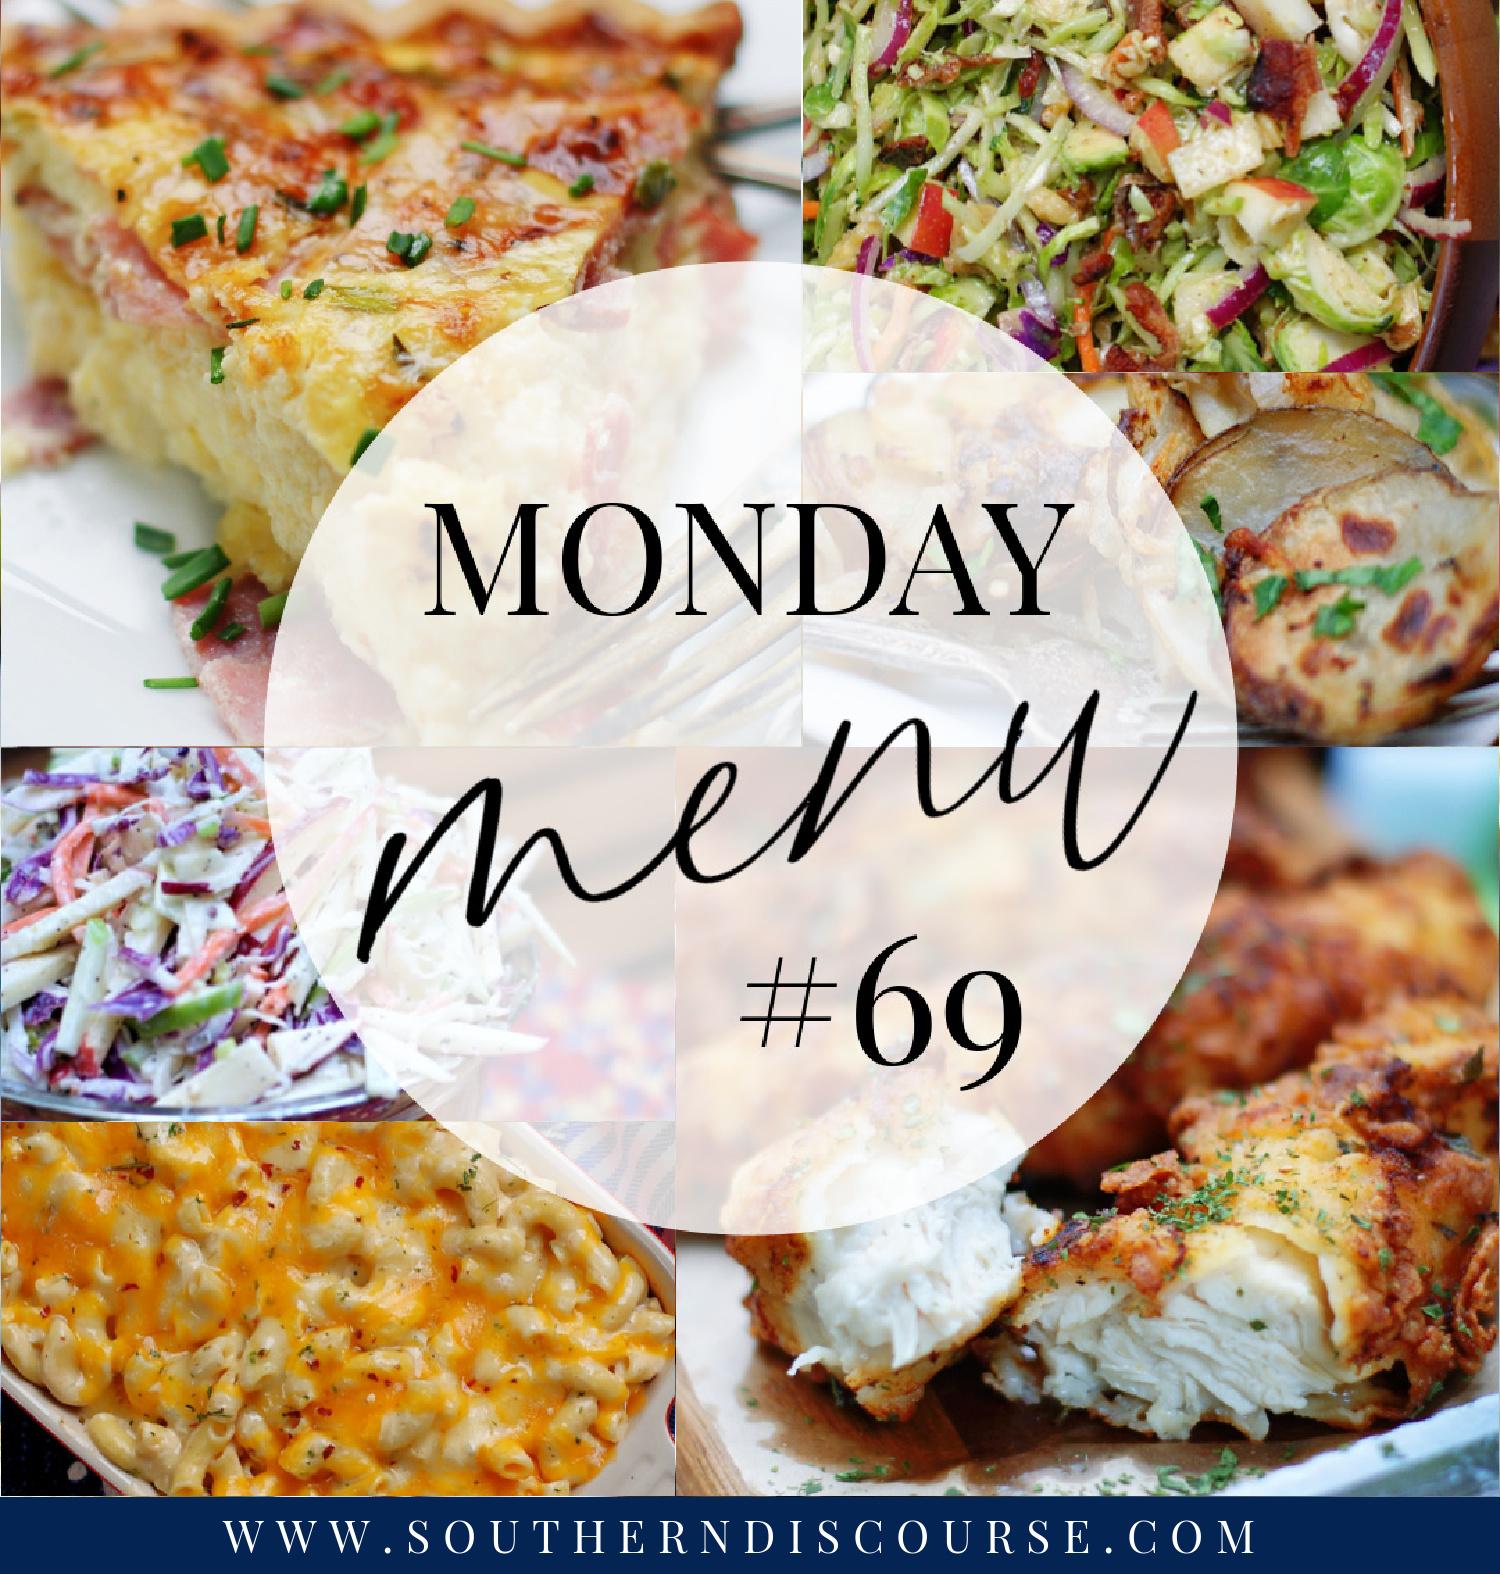 Monday Menu title collage of 2 meal planning menus